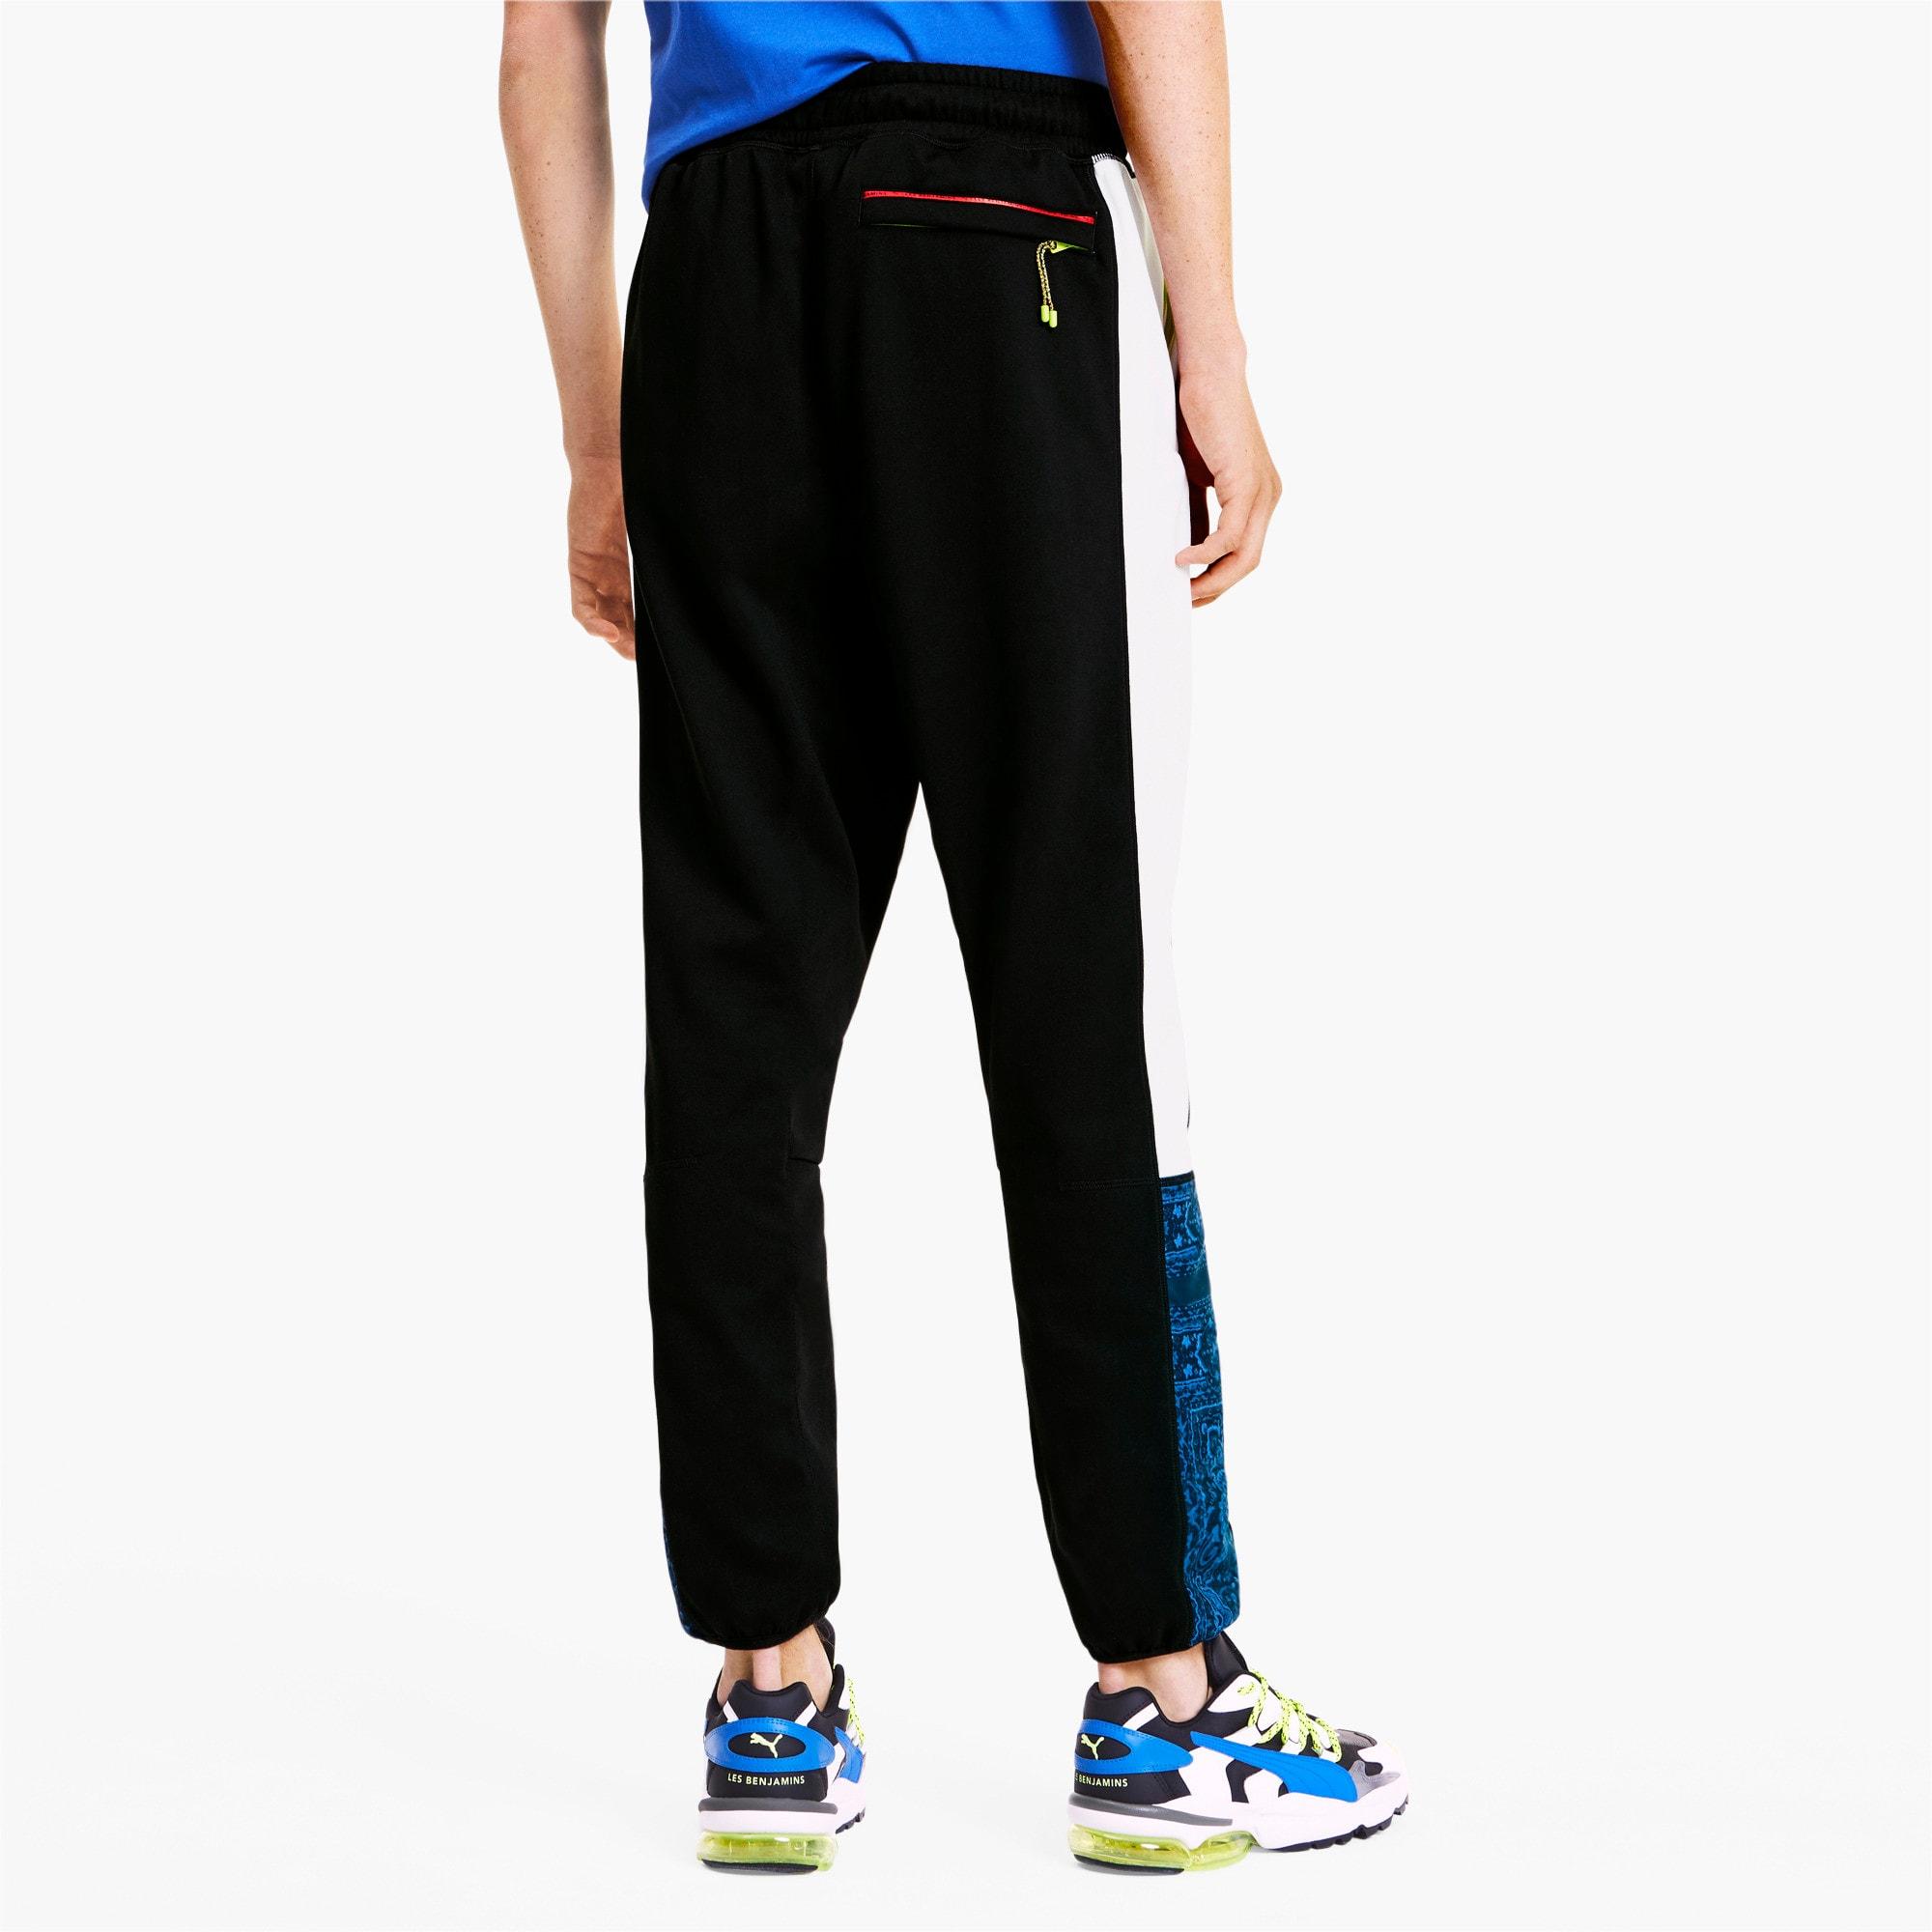 Miniatura 2 de Pantalones deportivos PUMA x LES BENJAMINS para hombre, Puma White, mediano